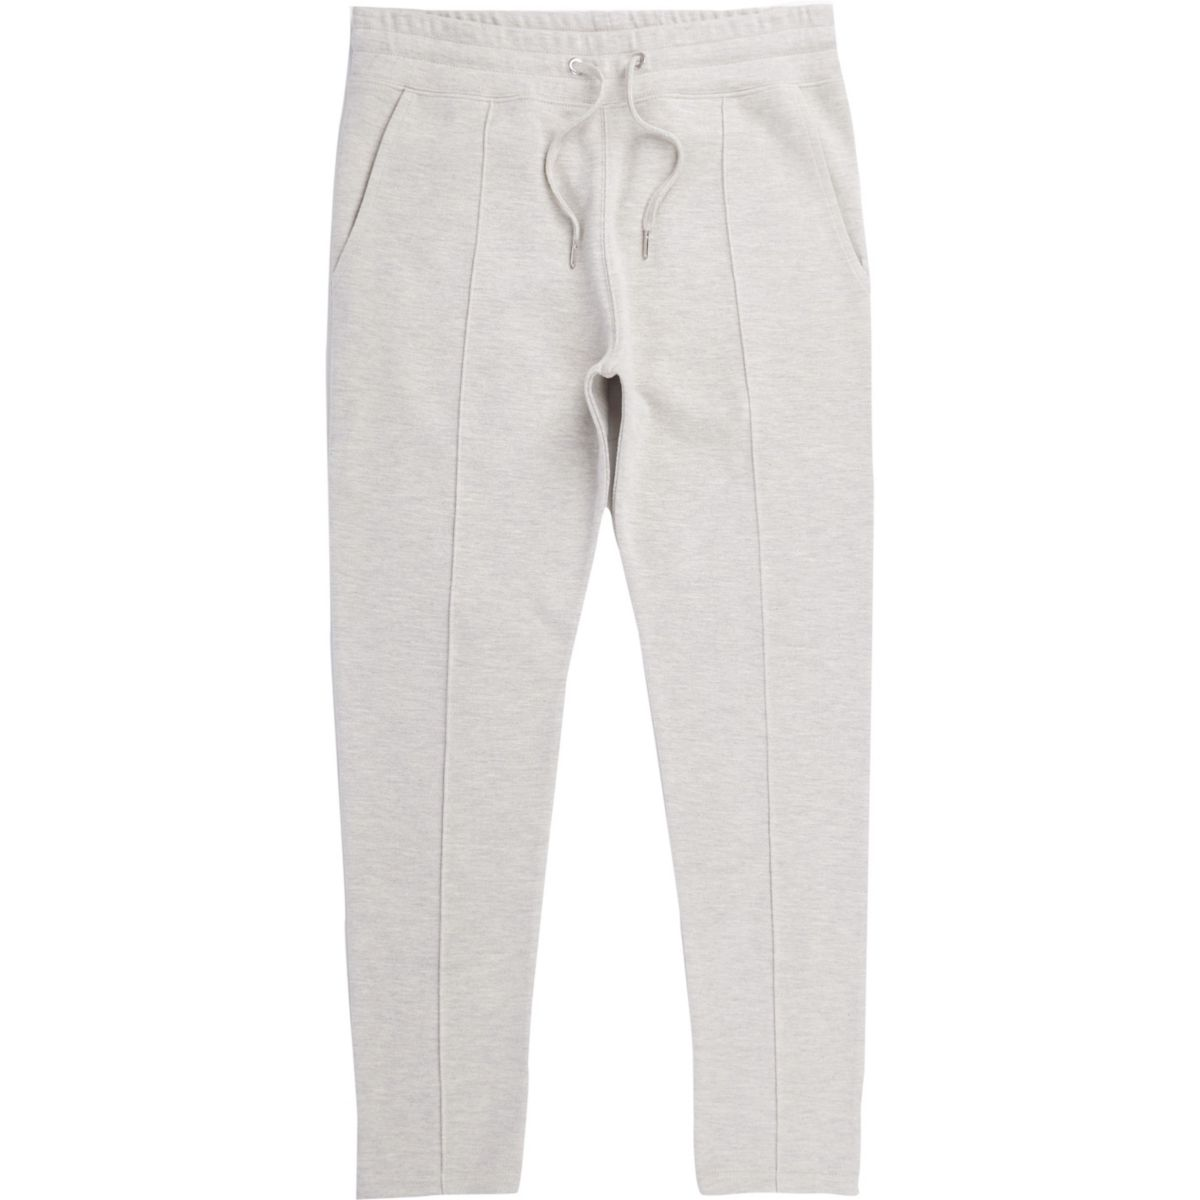 Grey jogging bottoms